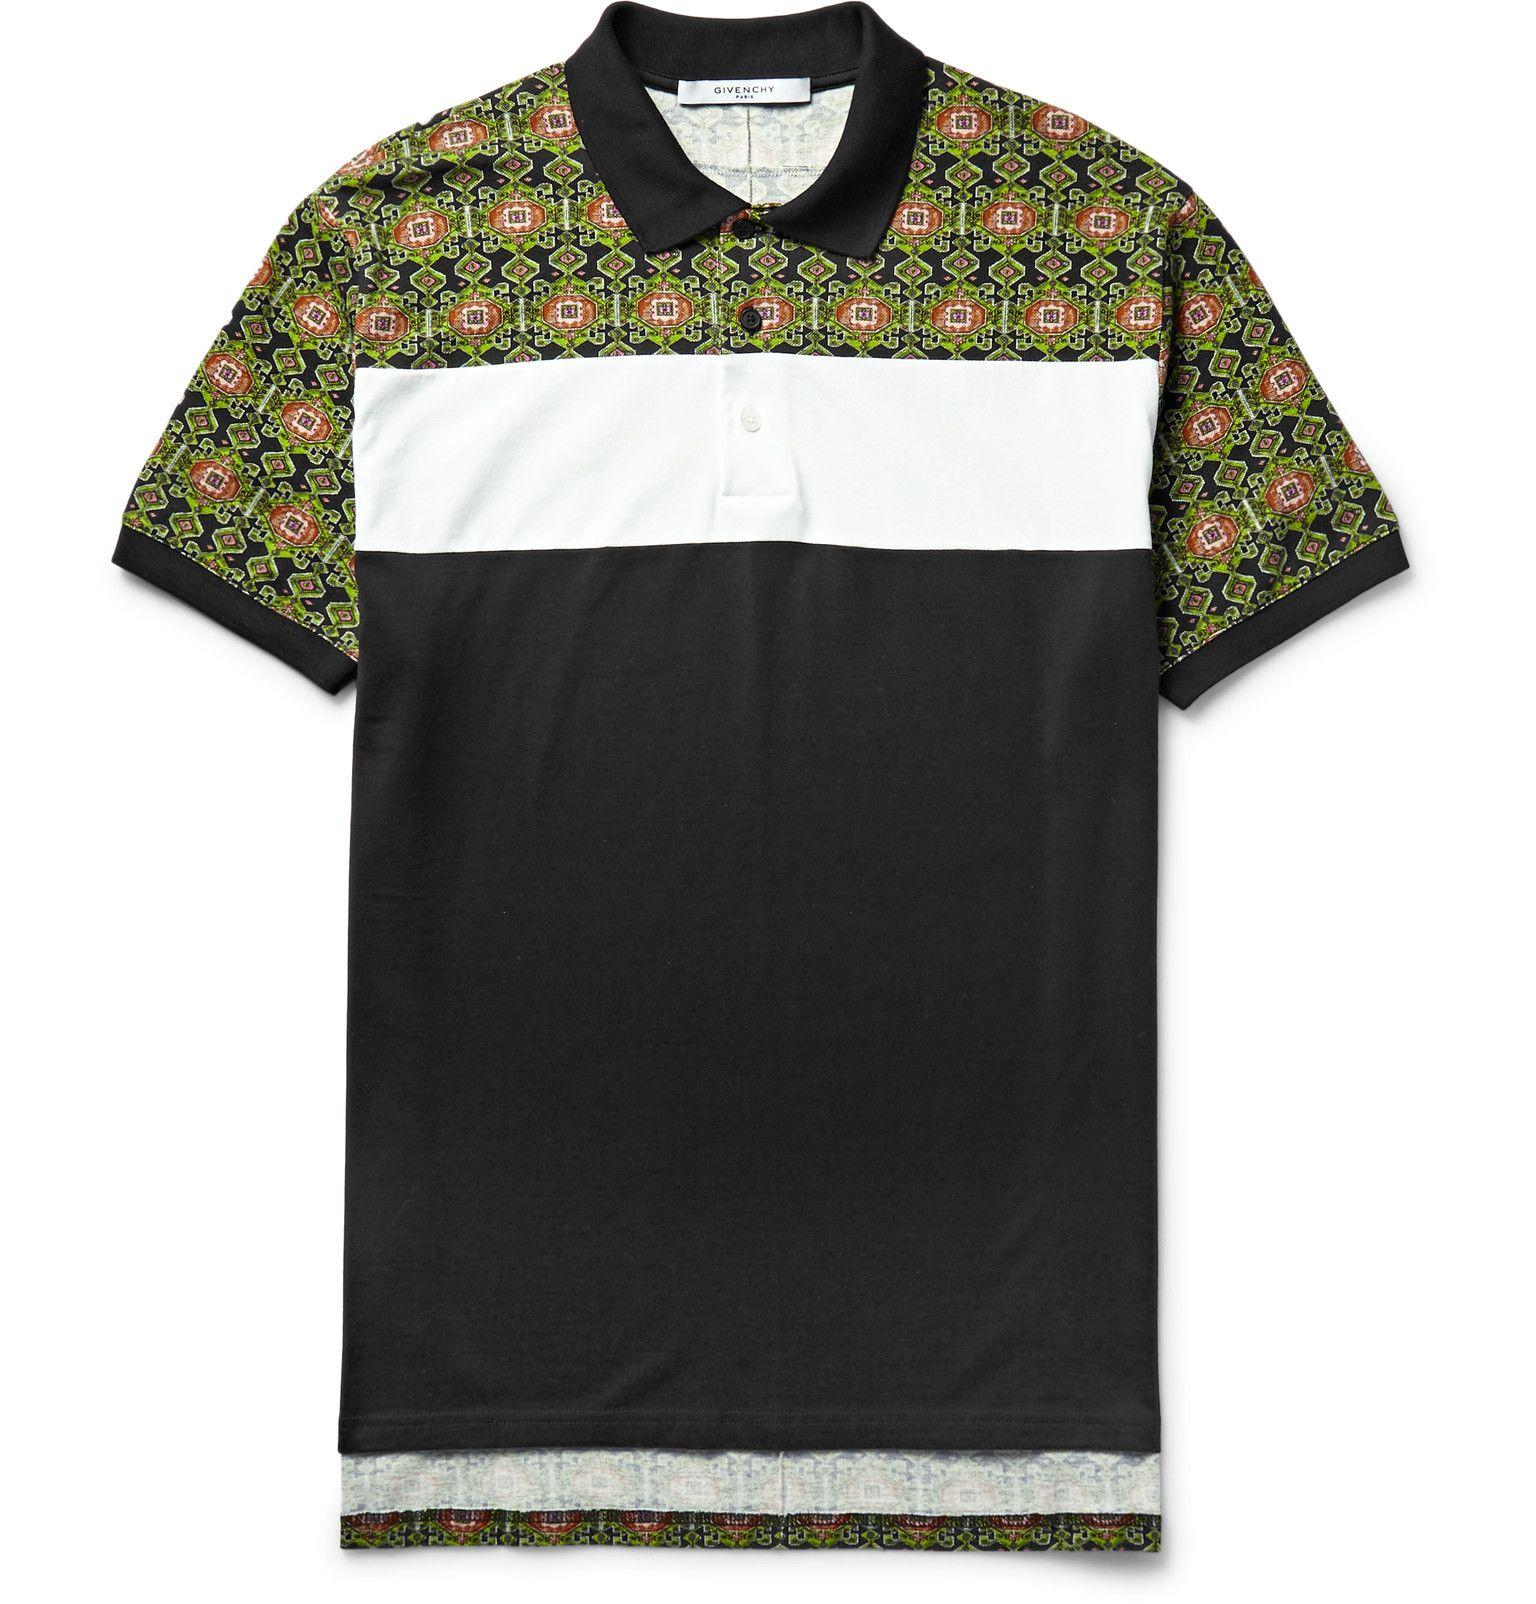 Polo Shirt Design Online Rldm